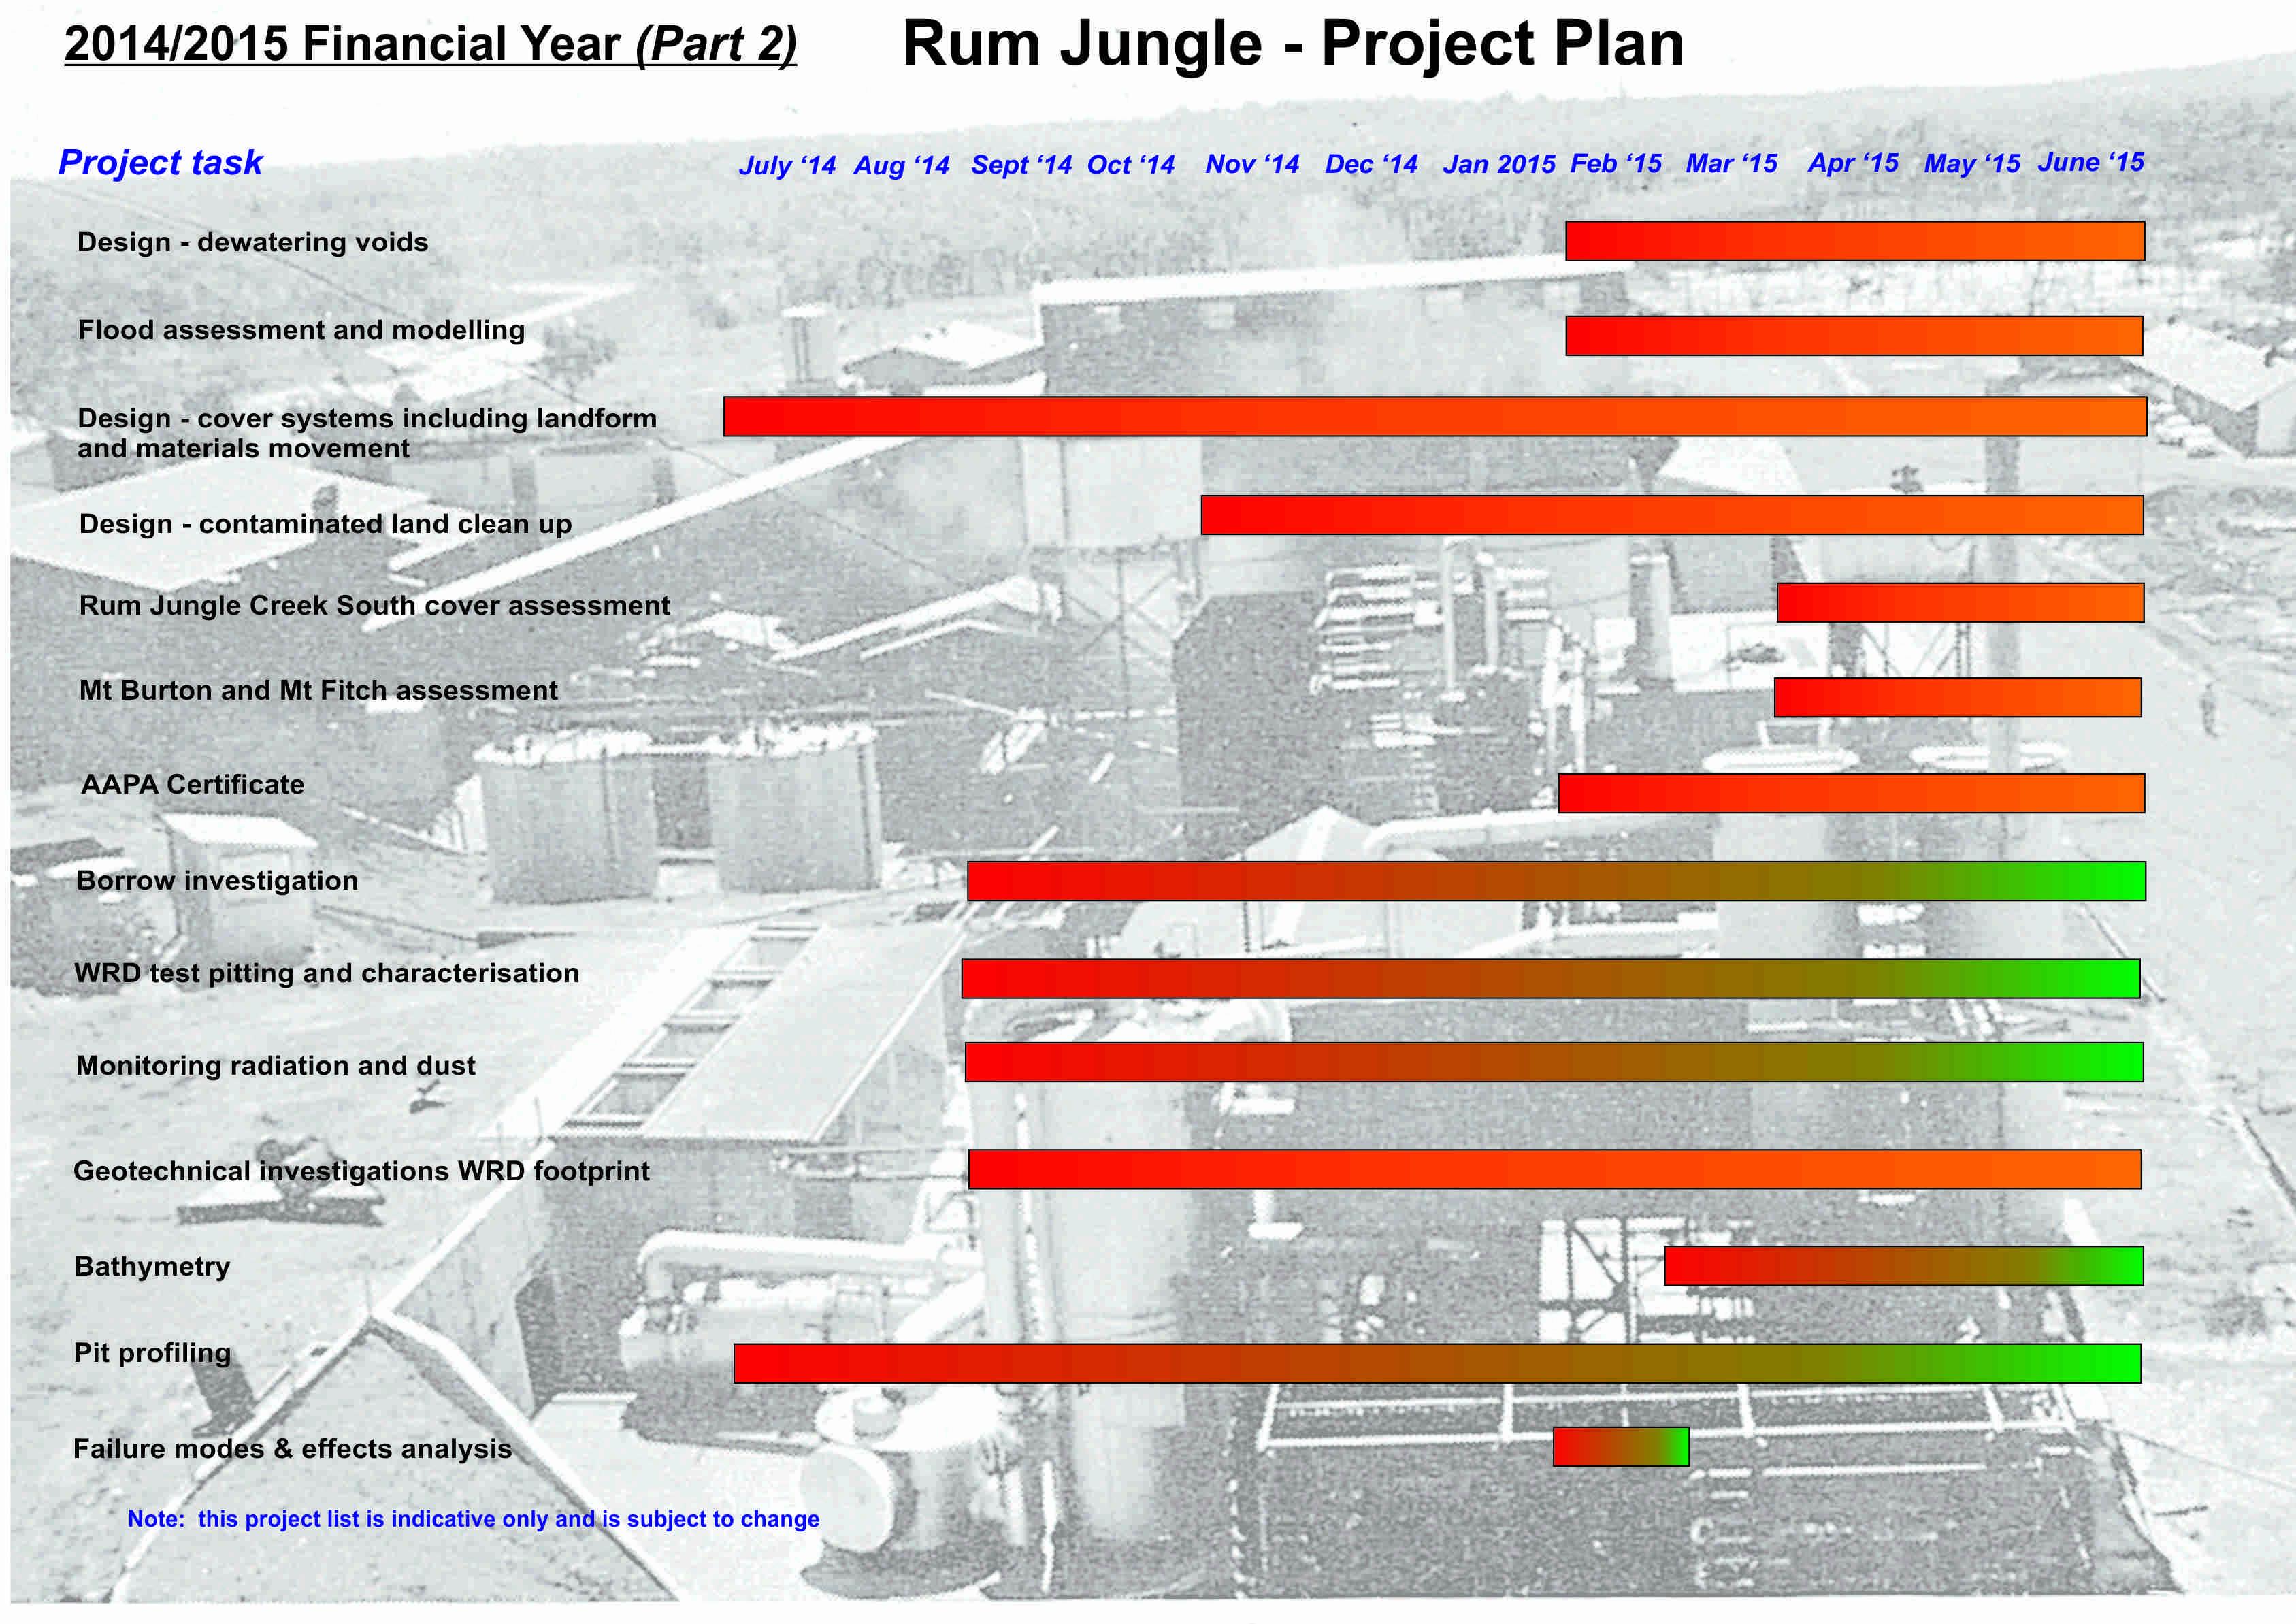 project plan 14-15 (part 2)